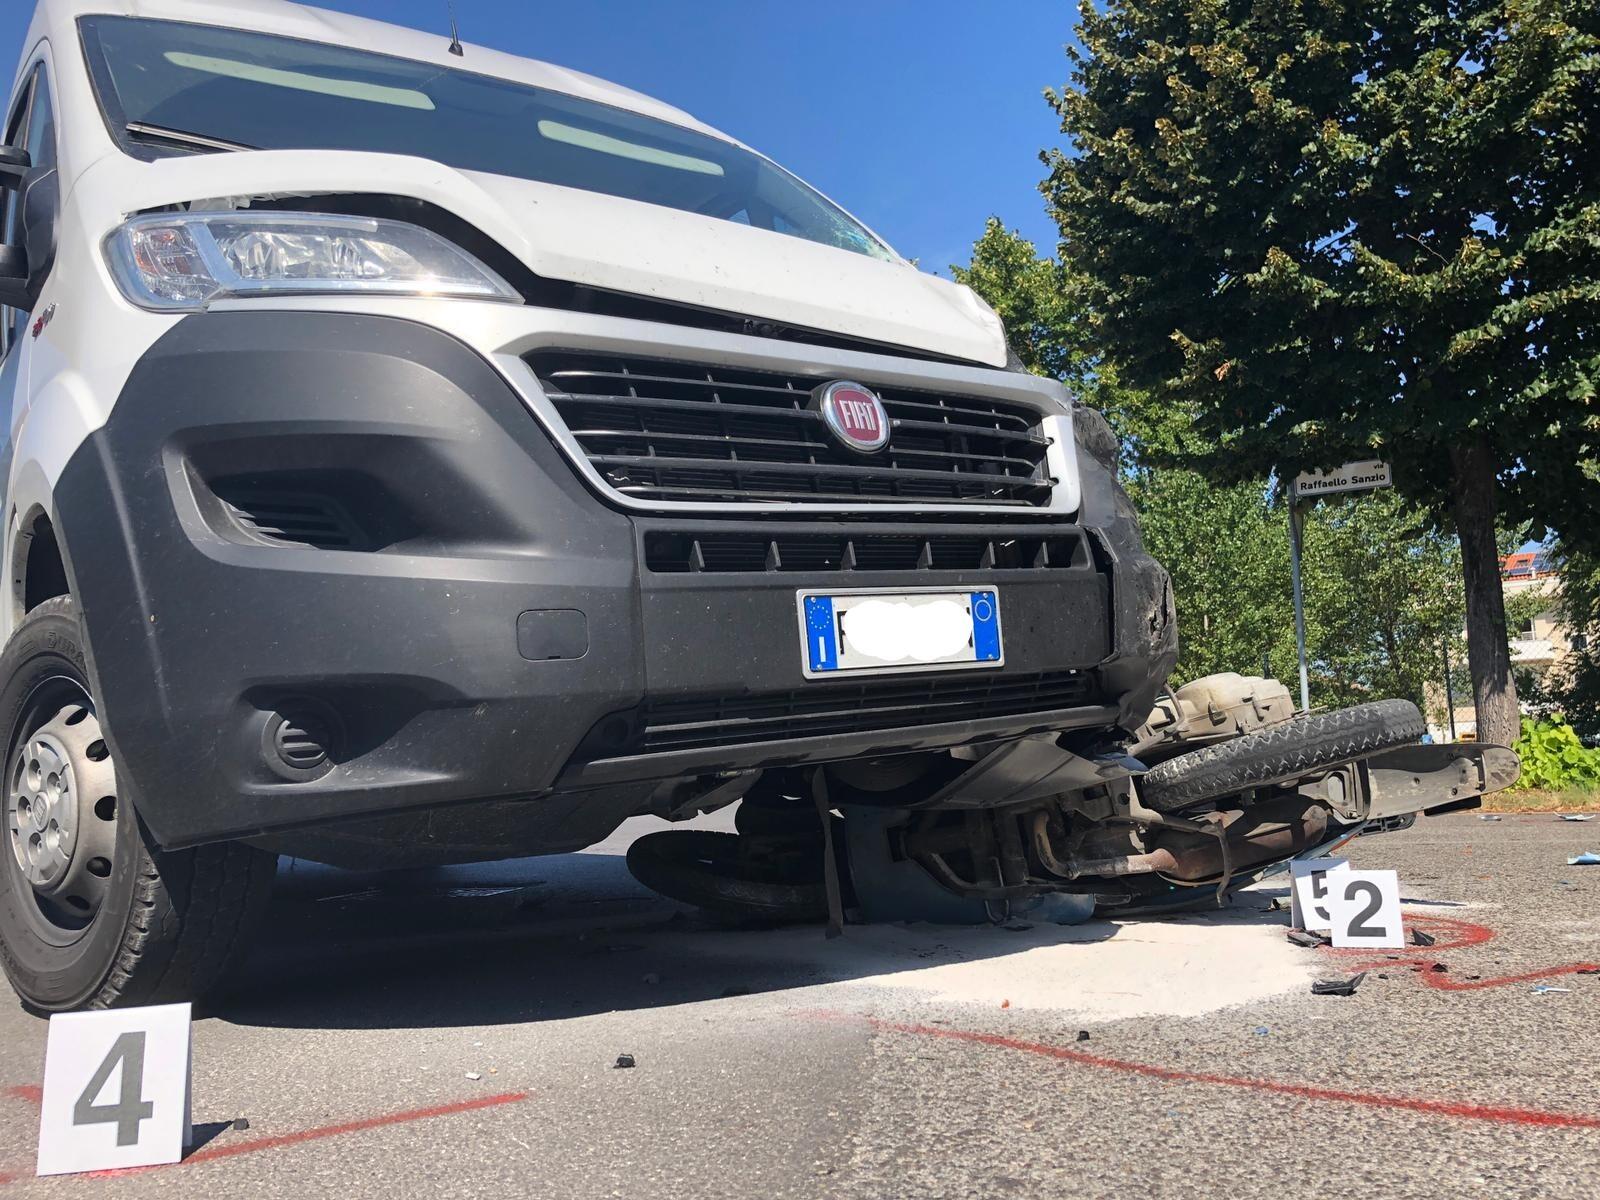 Tragedia a Cesenatico, 19enne in scooter muore in un incidente